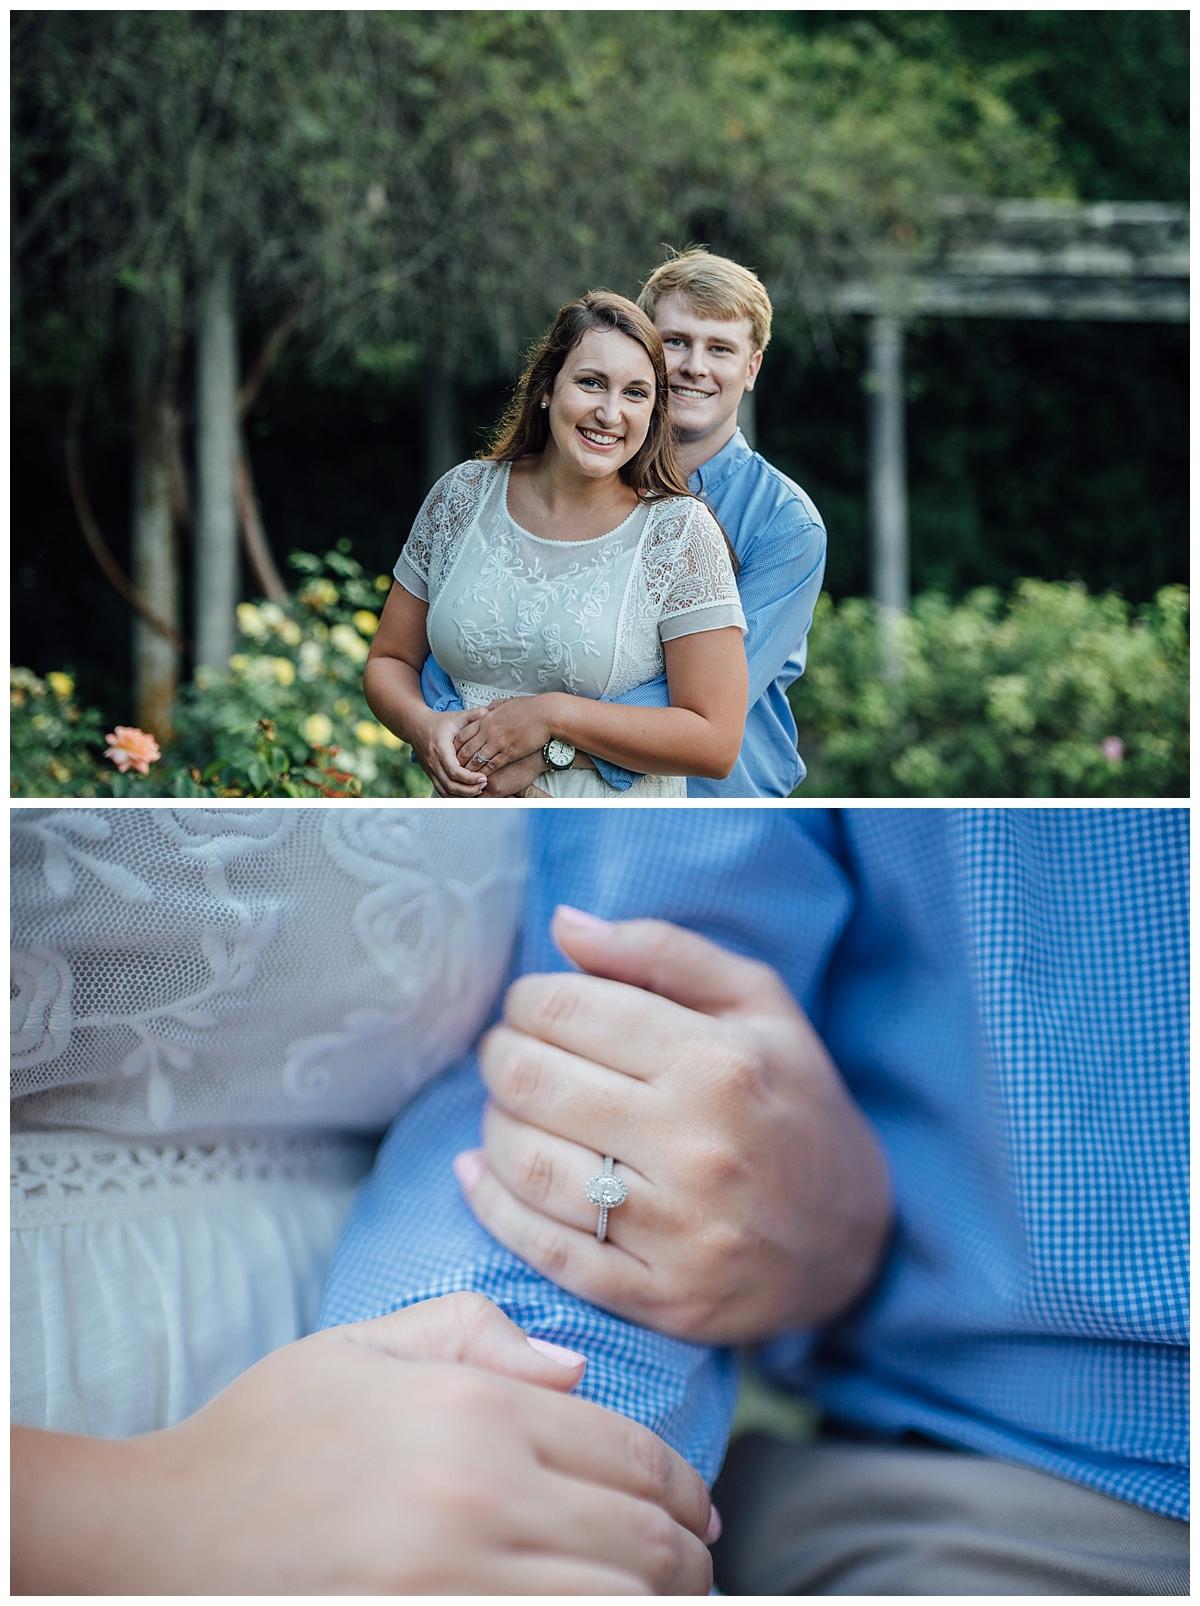 lindsey ann photography, engaged, birmingham engagement, wedding photographer, birmingham wedding photographer, botanical gardens